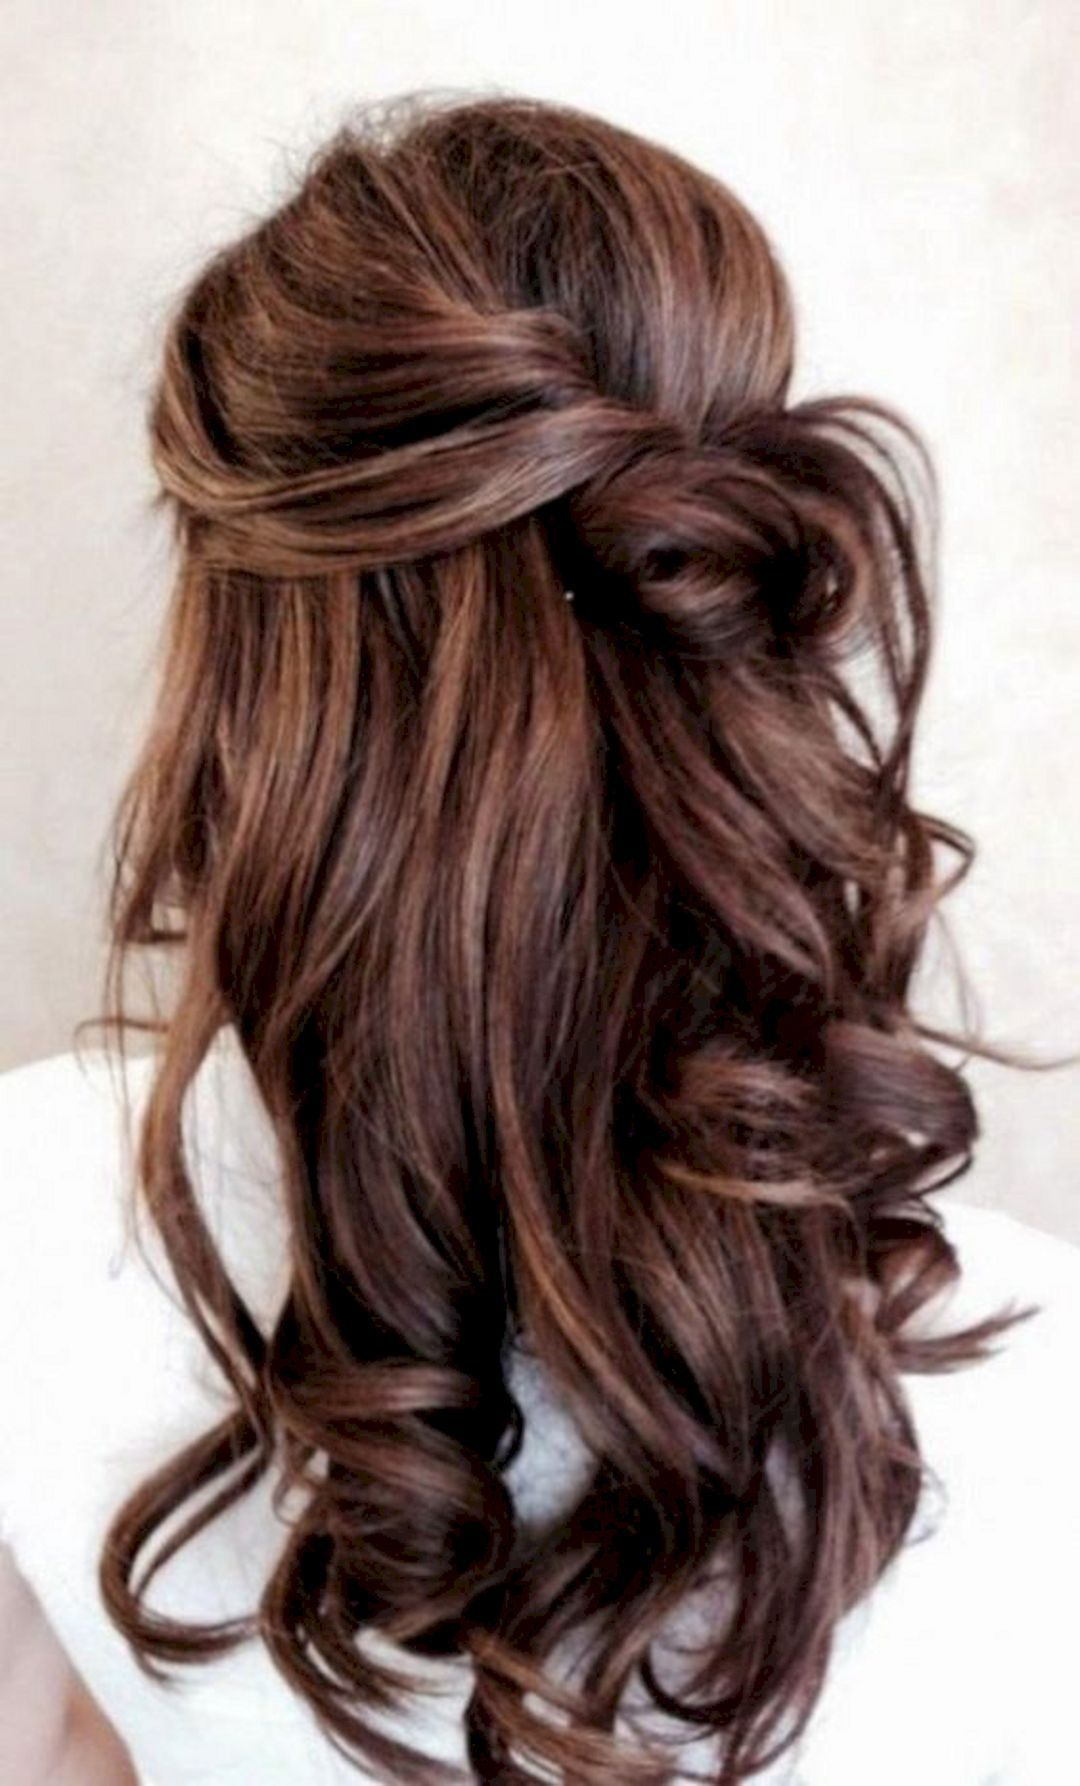 Stunning half up half down wedding hairstyles ideas no u oosile